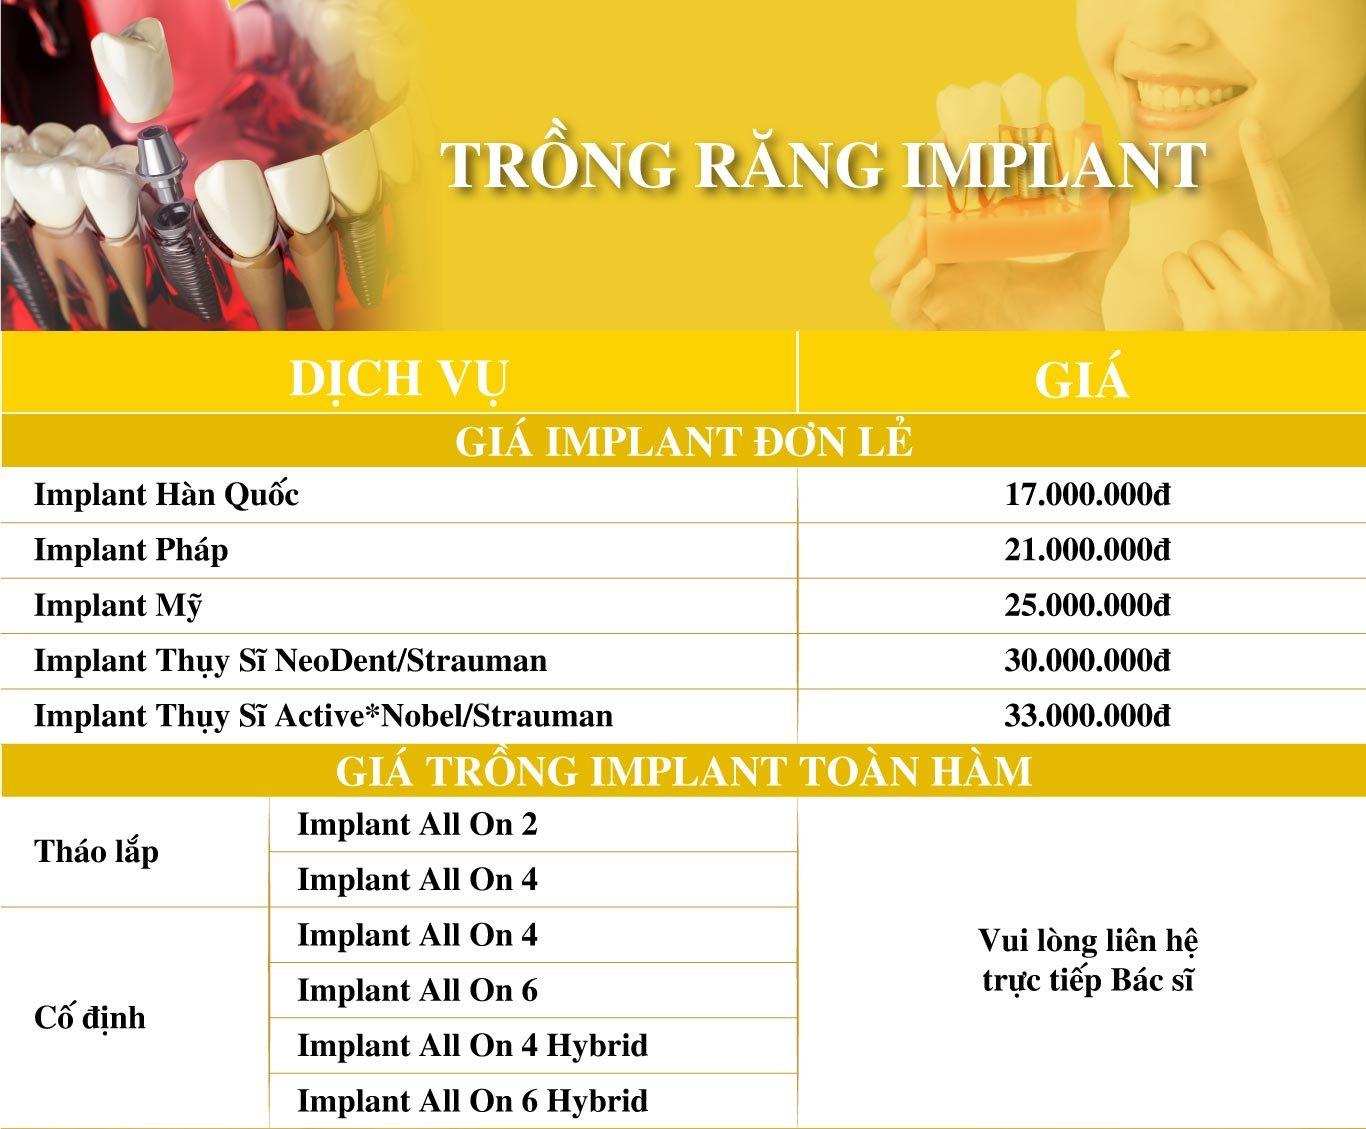 Dich Vu Trong Rang Implant Cay Ghep Implant Nha Khoa Dong A